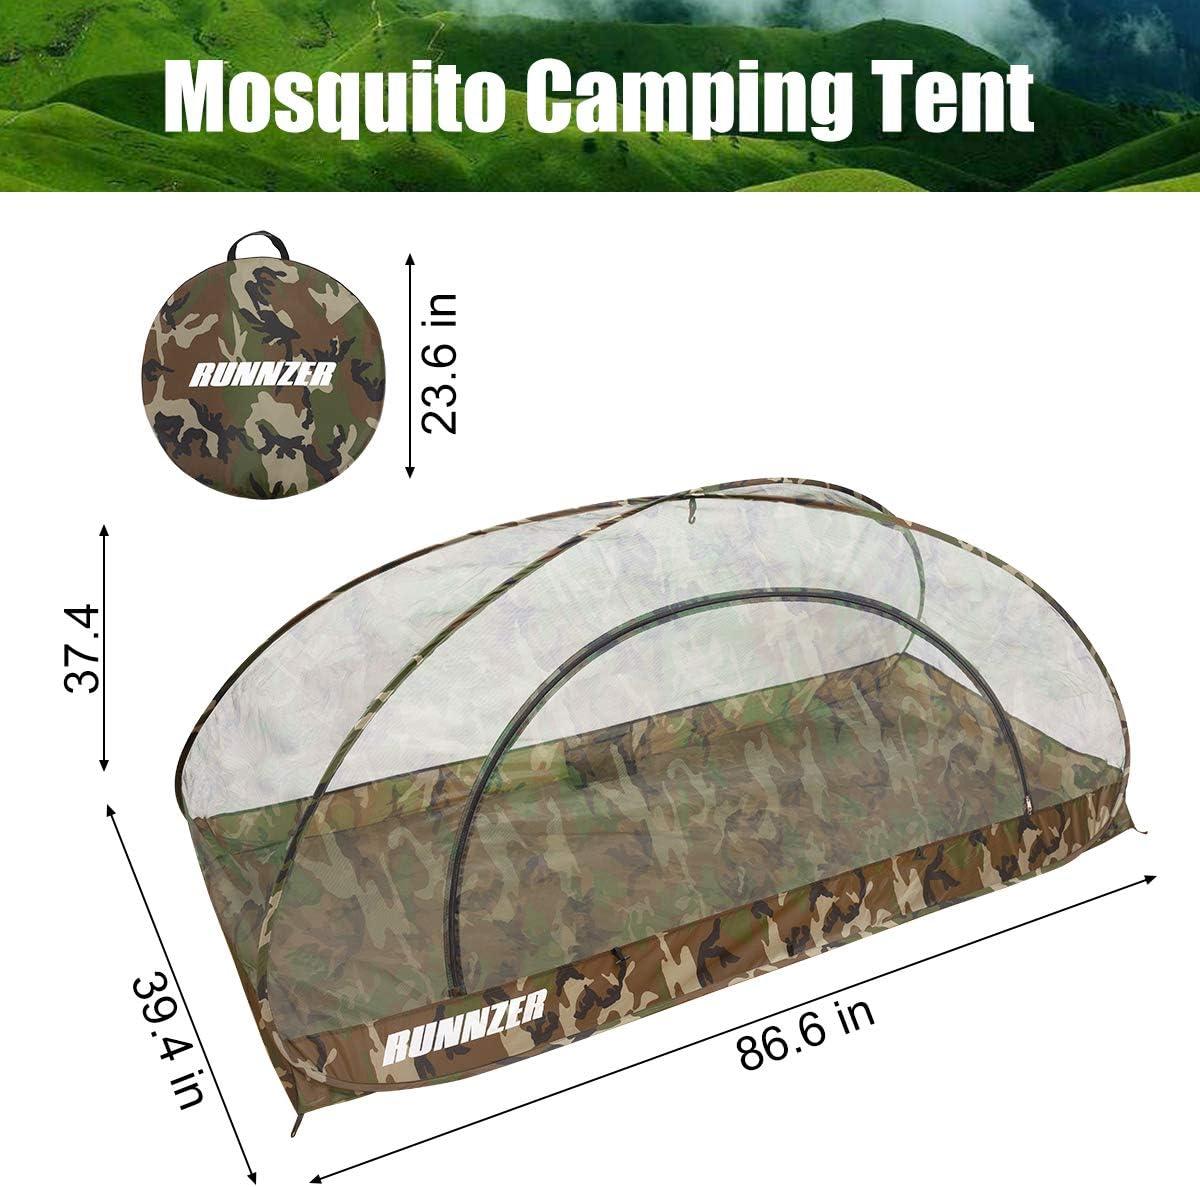 RUNNZER Mosquito Tent